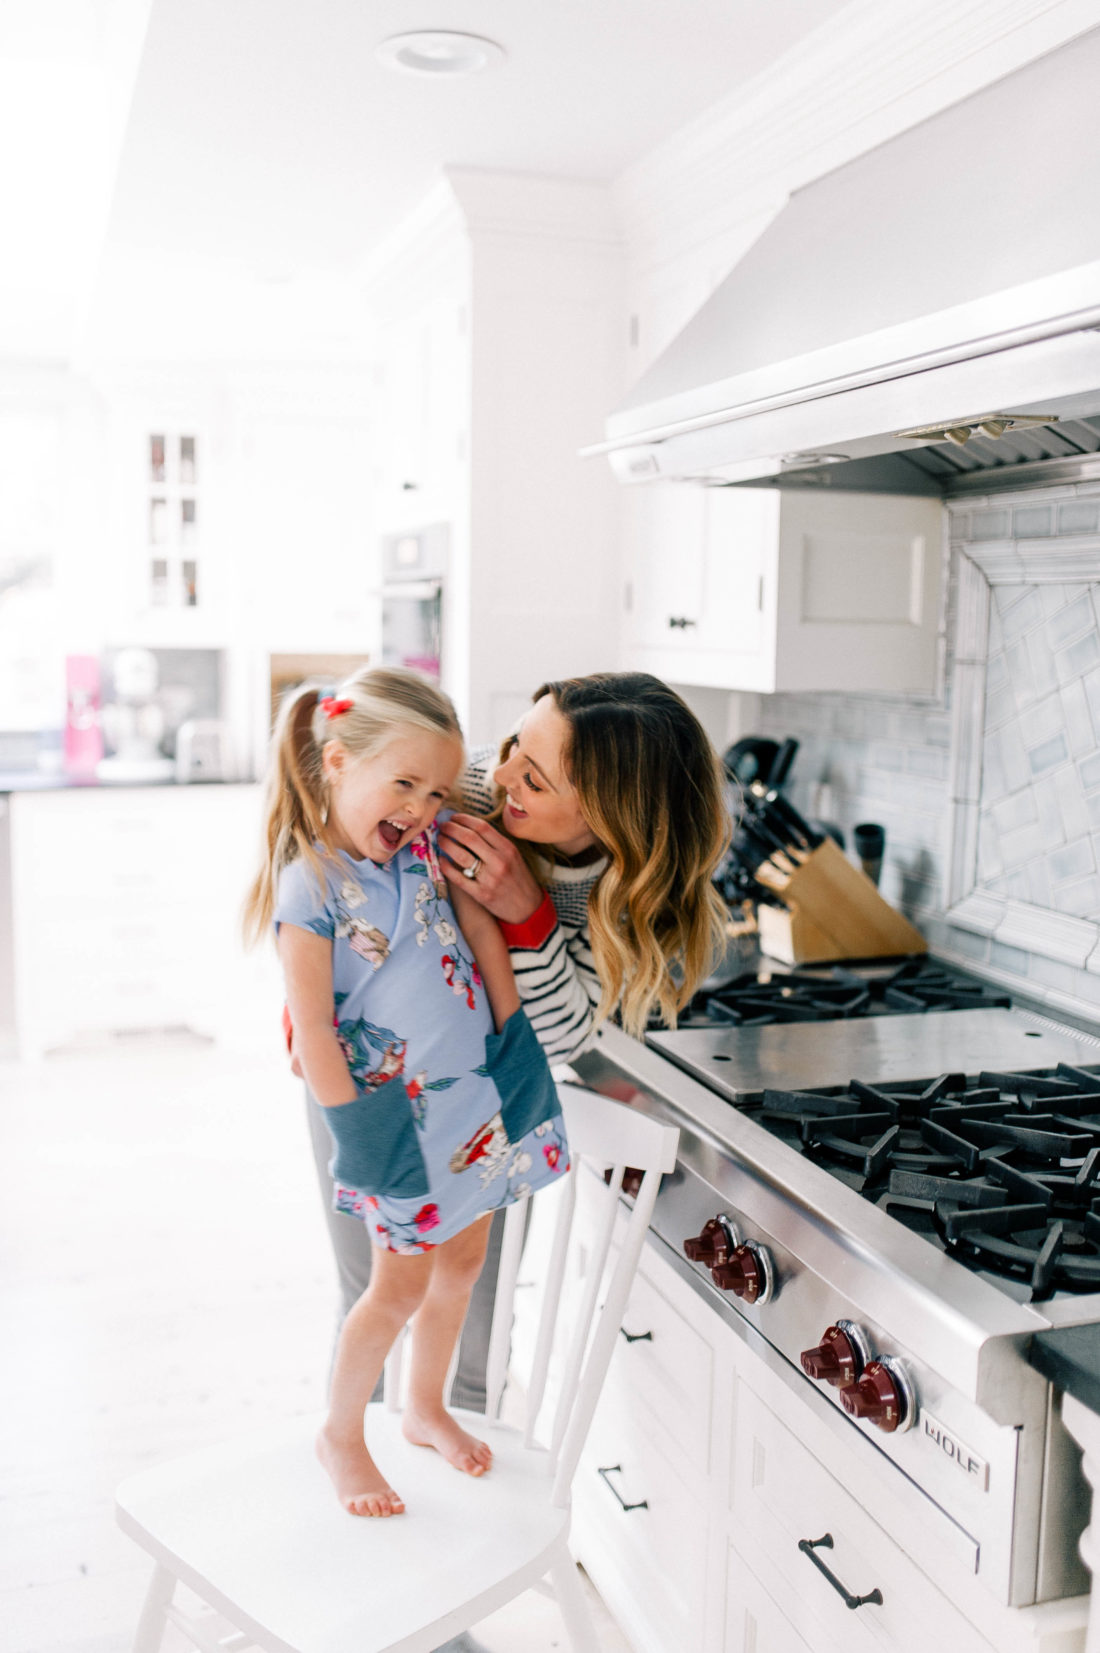 Eva Amurri Martino plays around and cooks in the kitchen with three year old daughter Marlowe